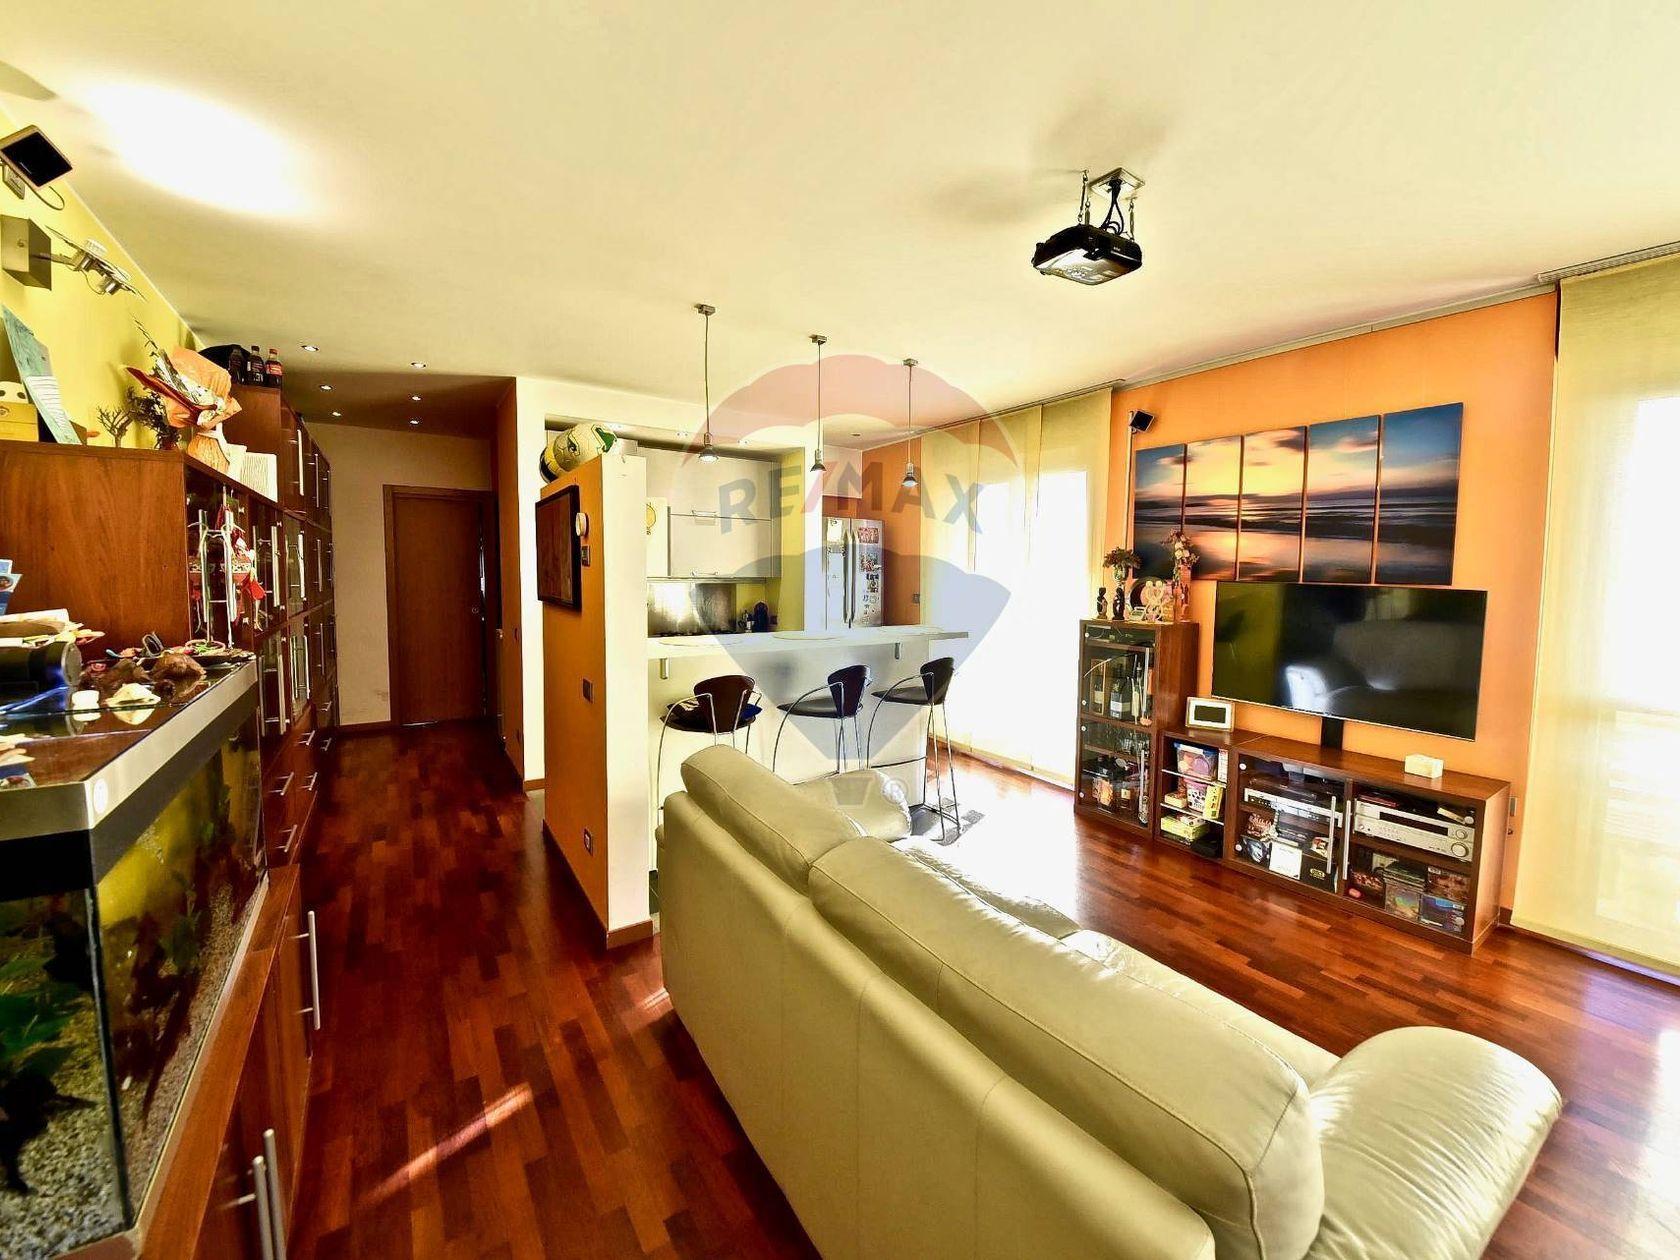 Appartamento Cascina ferrara, Saronno, VA Vendita - Foto 4